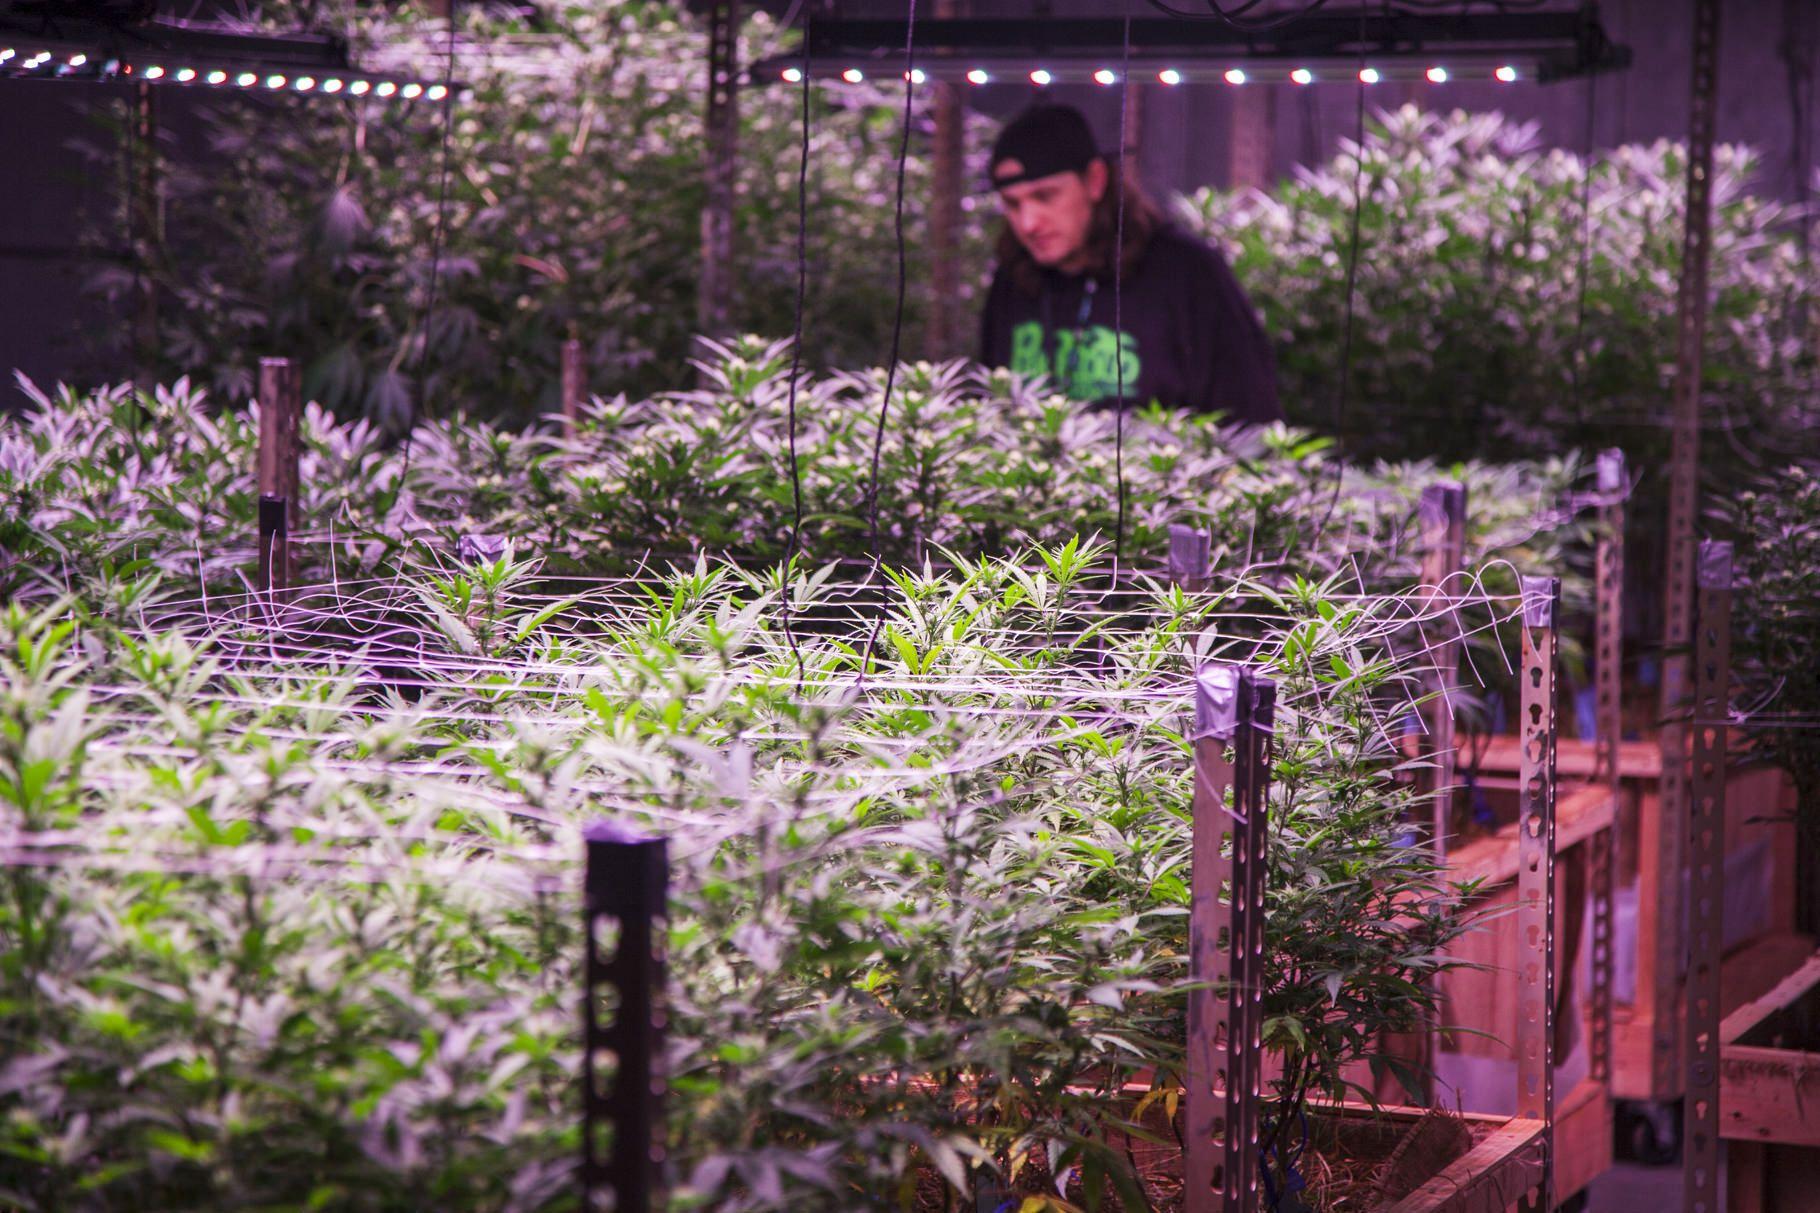 photos marijuana business magazine, Behind the Cover: Photos from Marijuana Business Magazine's January Issue